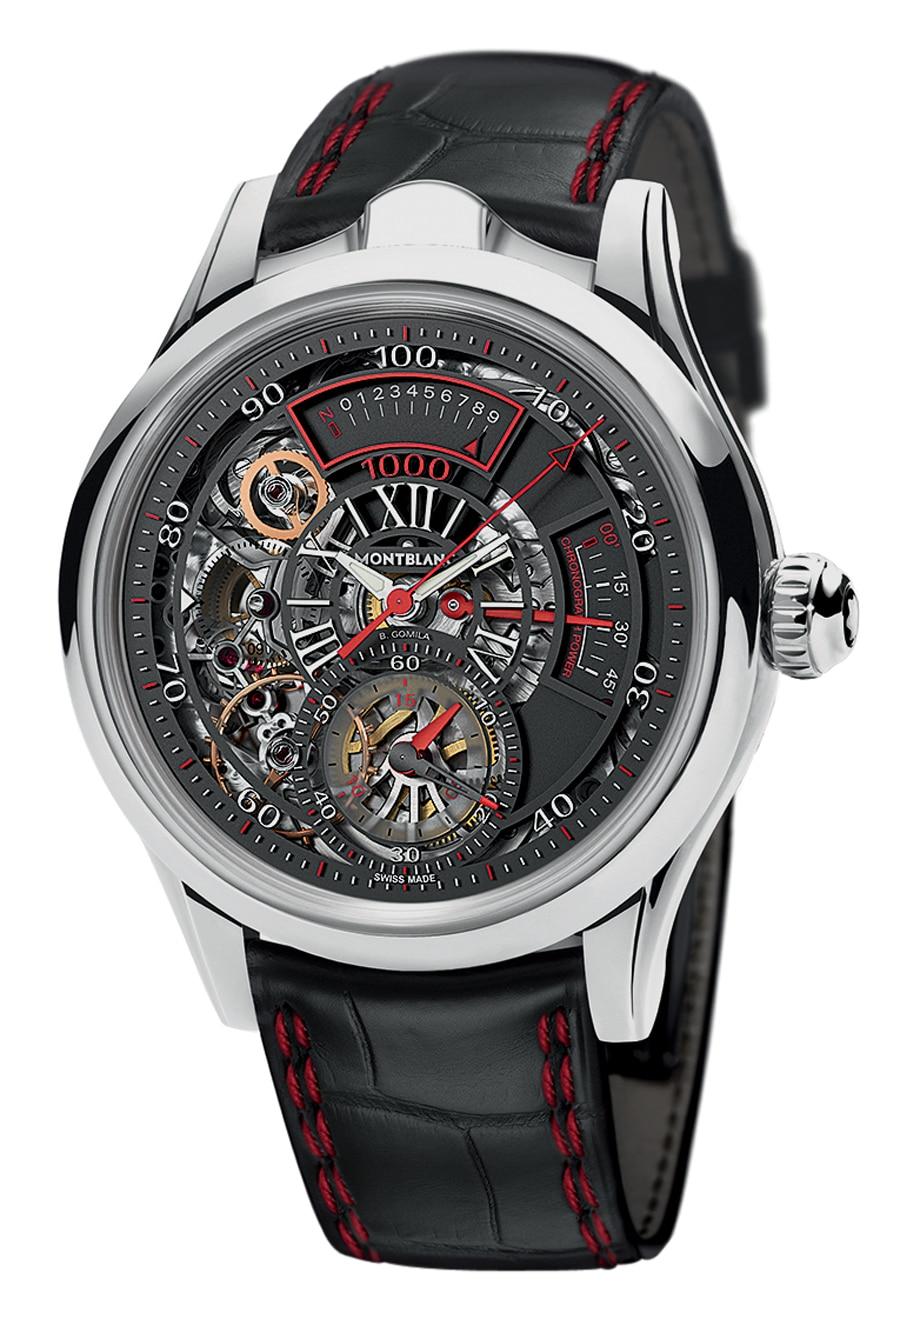 Montblanc: Timewriter II Chronographe Bi-Fréquence